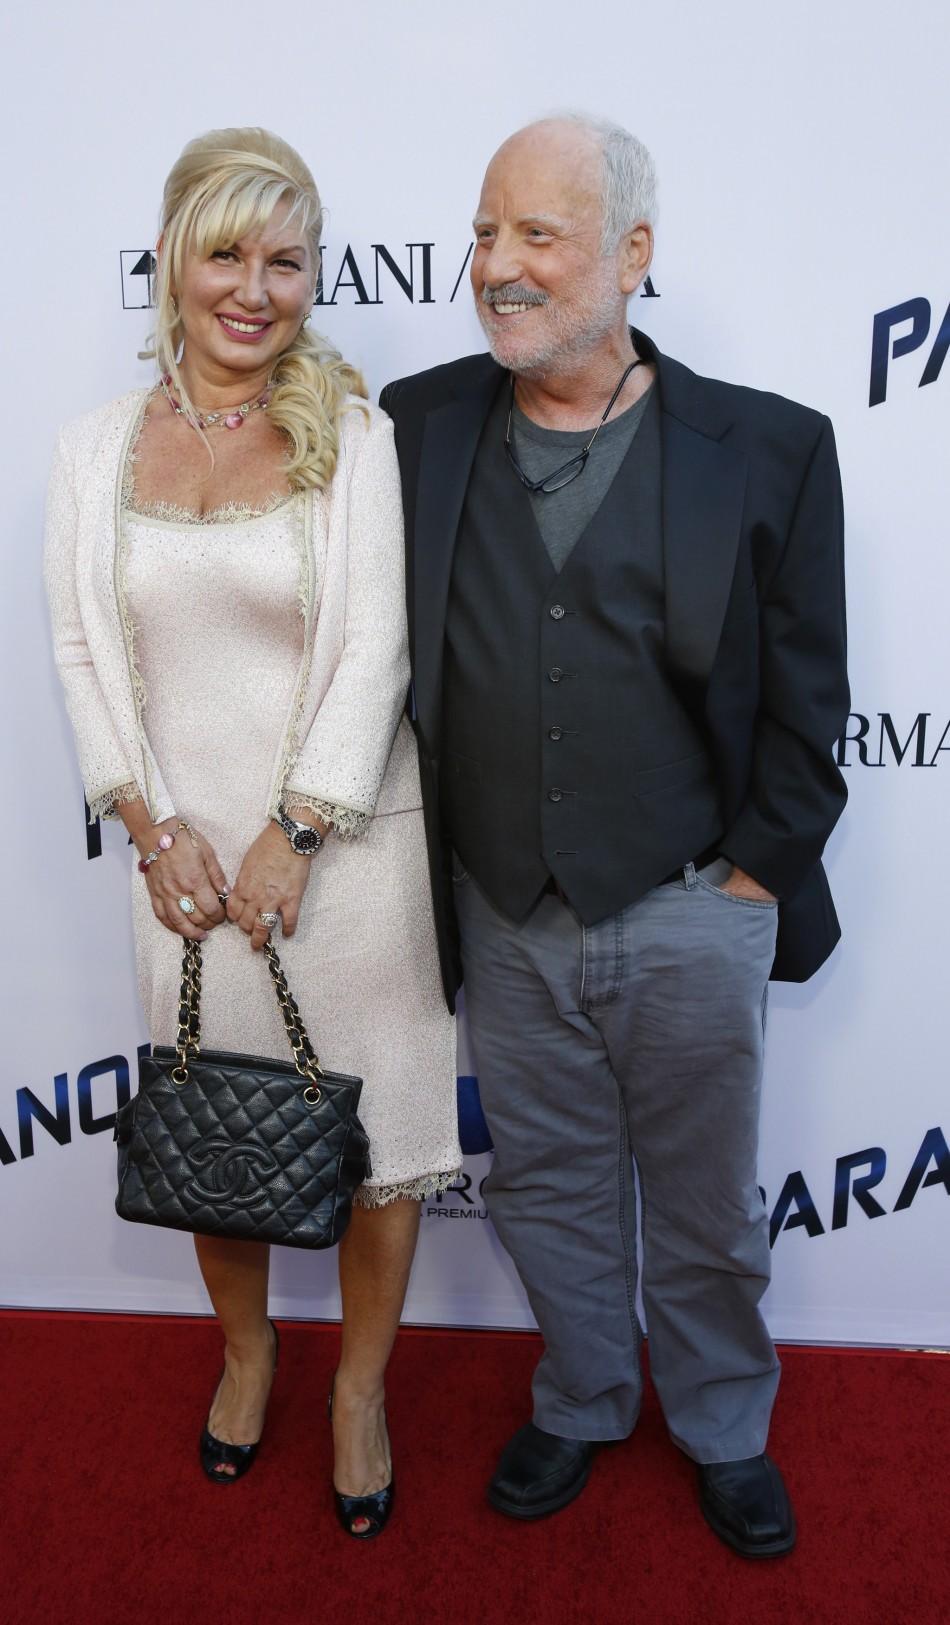 Cast member Richard Dreyfuss and his wife Svetlana Erokhin pose at the premiere of